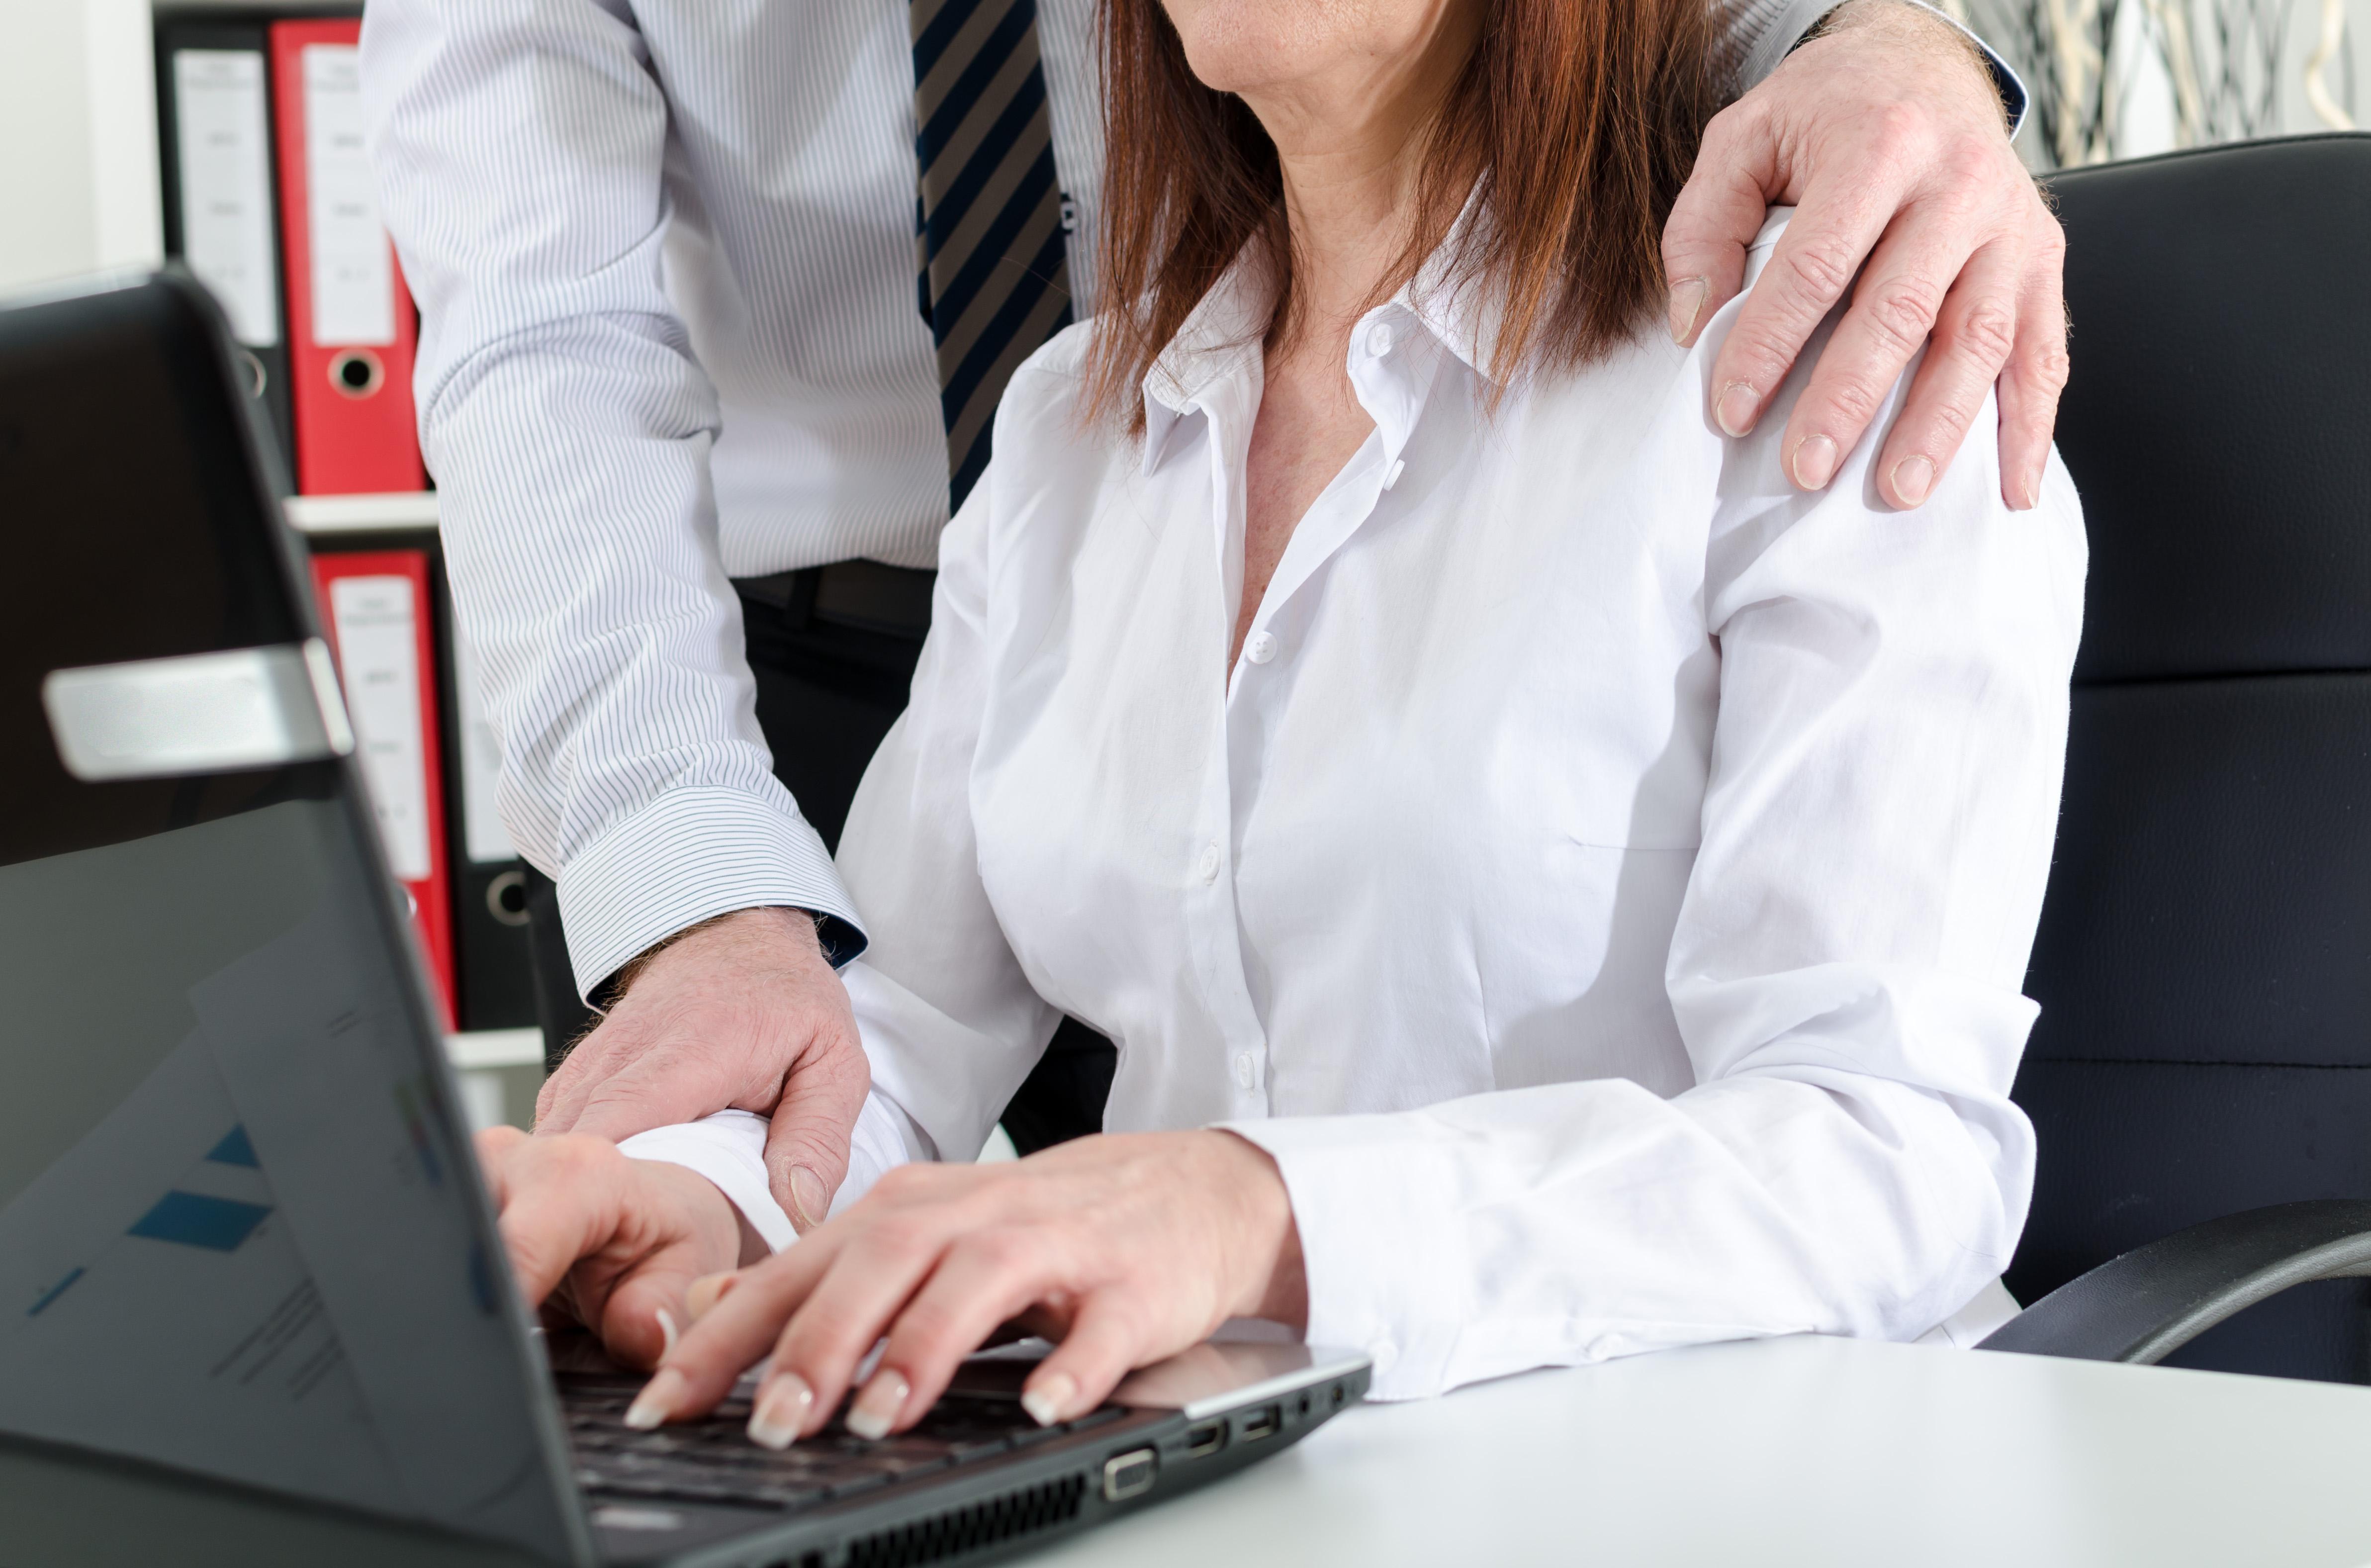 15 Harassment The 15 biggest HR challenges